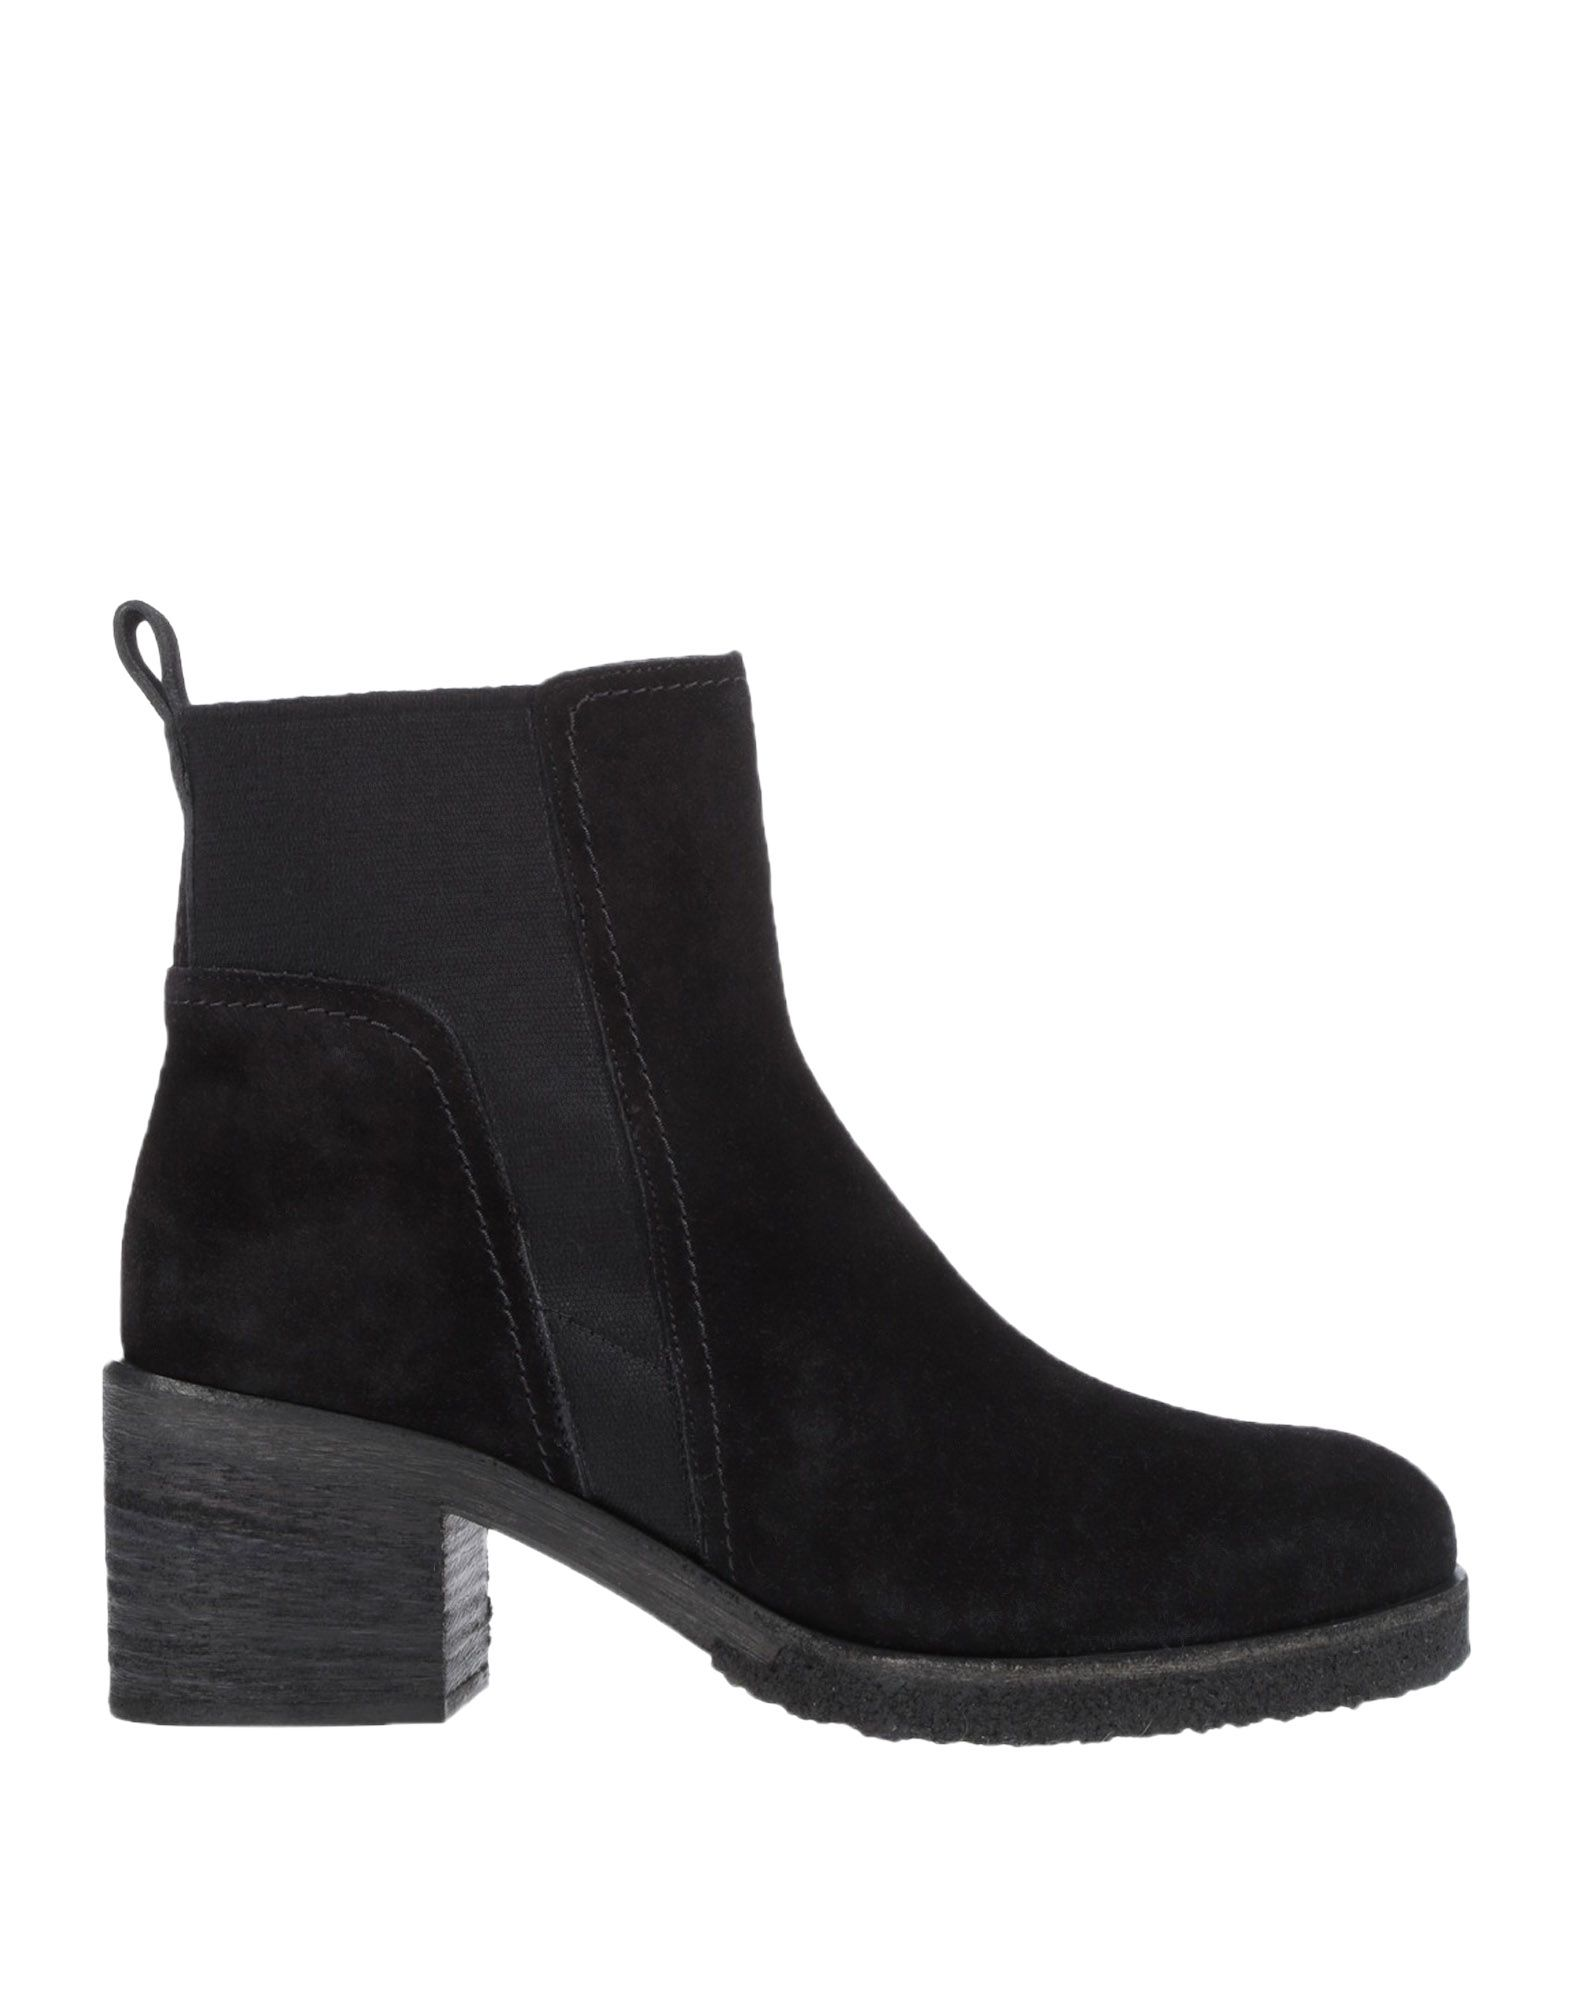 Rabatt Schuhe Roberto Del Carlo Stiefelette Damen  11536146DT